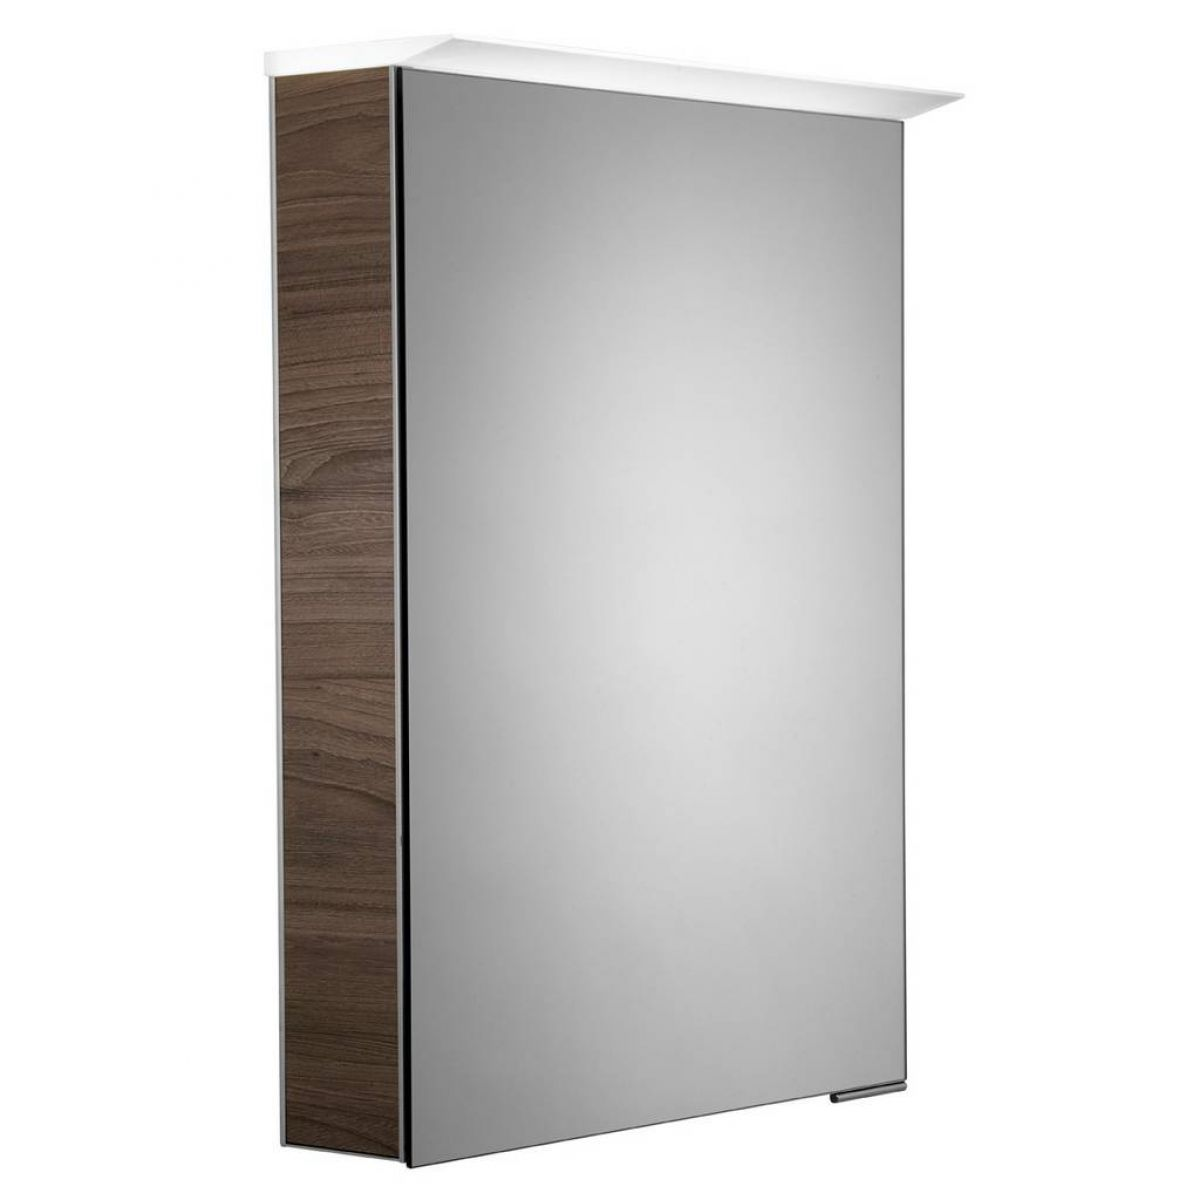 Roper Rhodes Virtue Led Illuminated Bathroom Cabinet